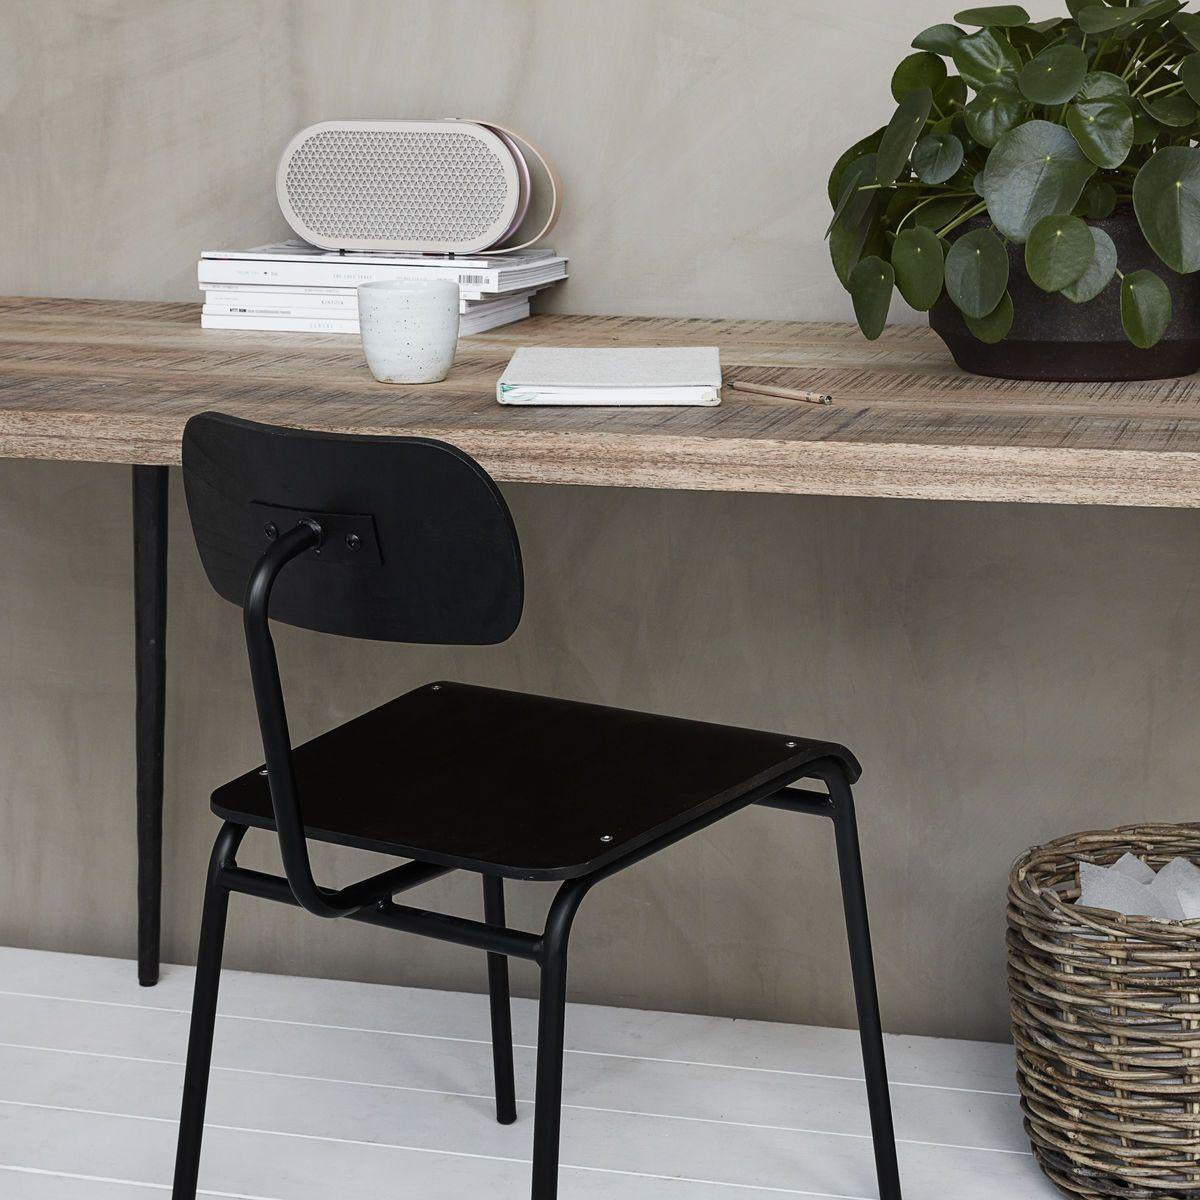 House Doctor Shop Dining Inspiration ChairSchoolBlackKk rtdsxhQC